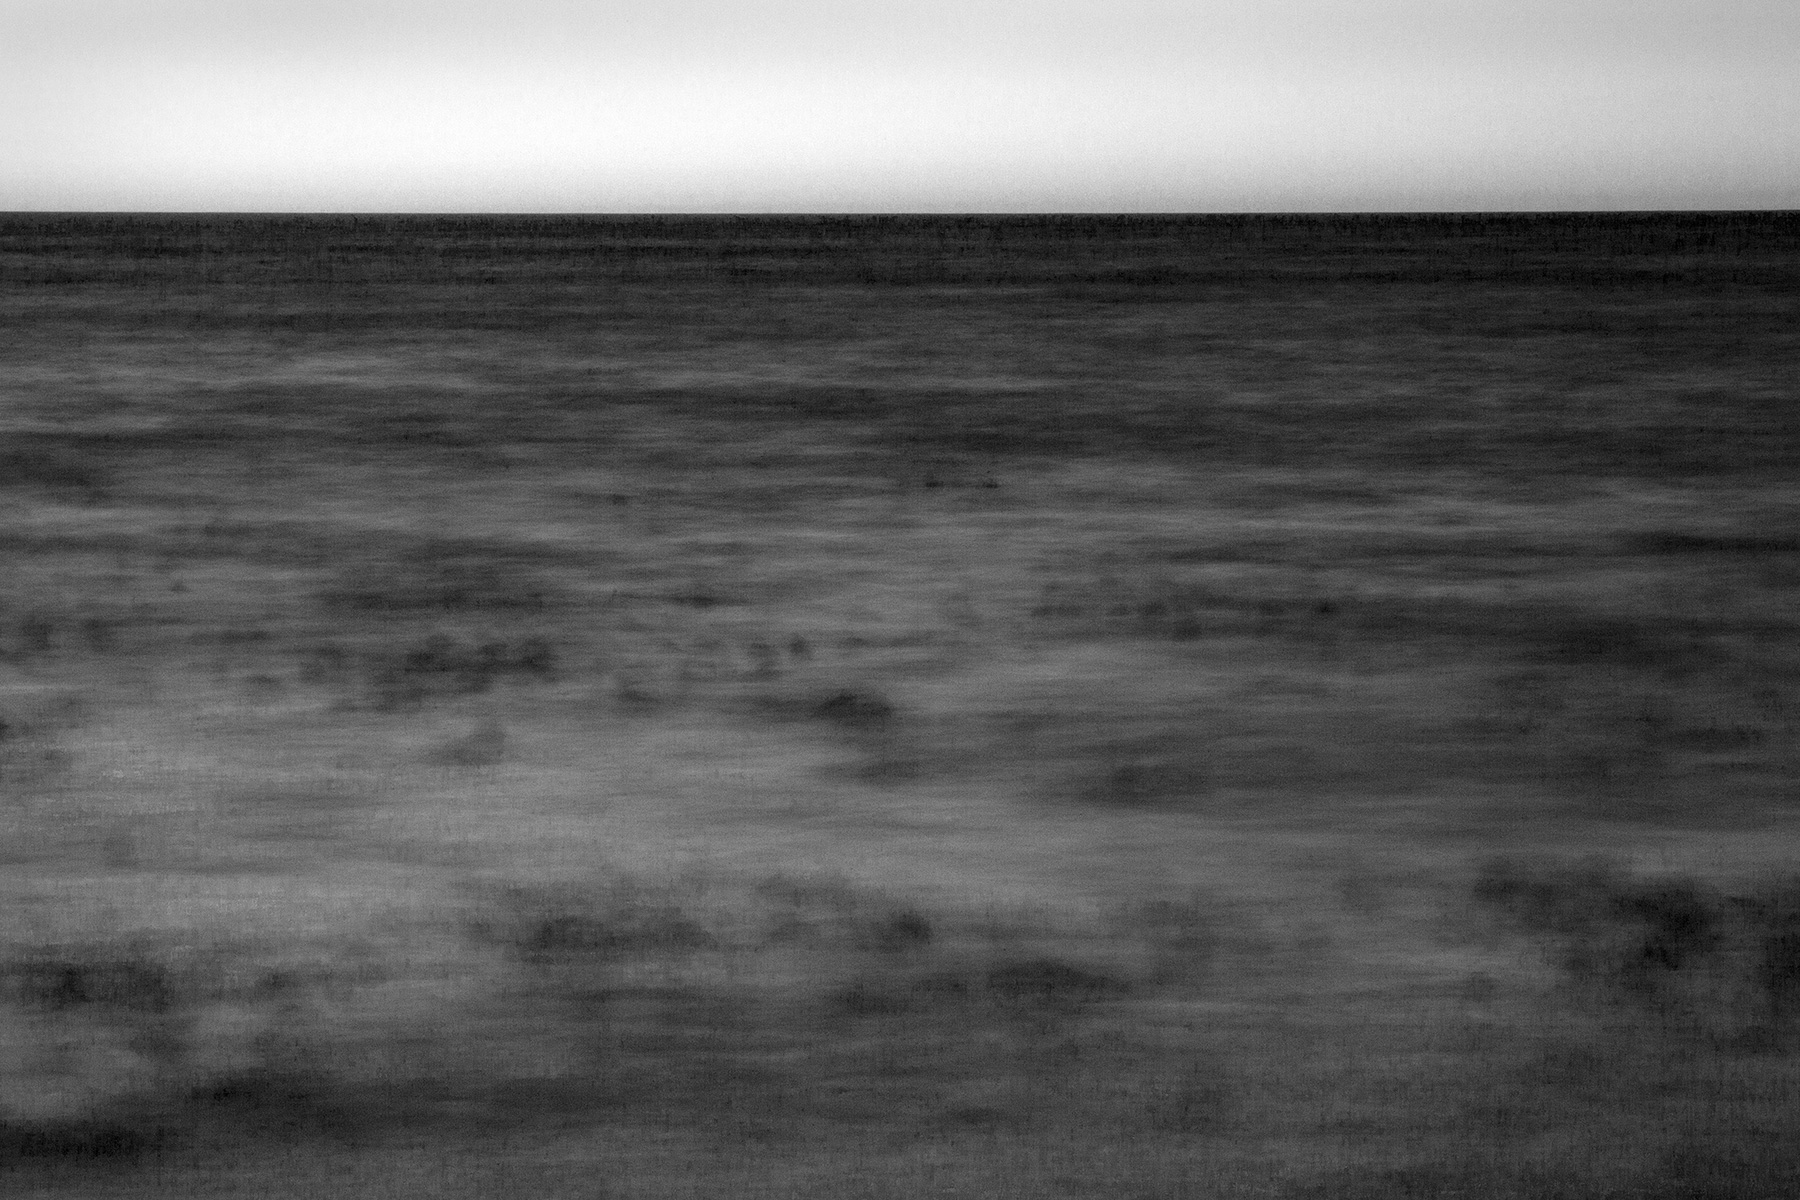 035-Seascape-14-120x90-cm-.jpg